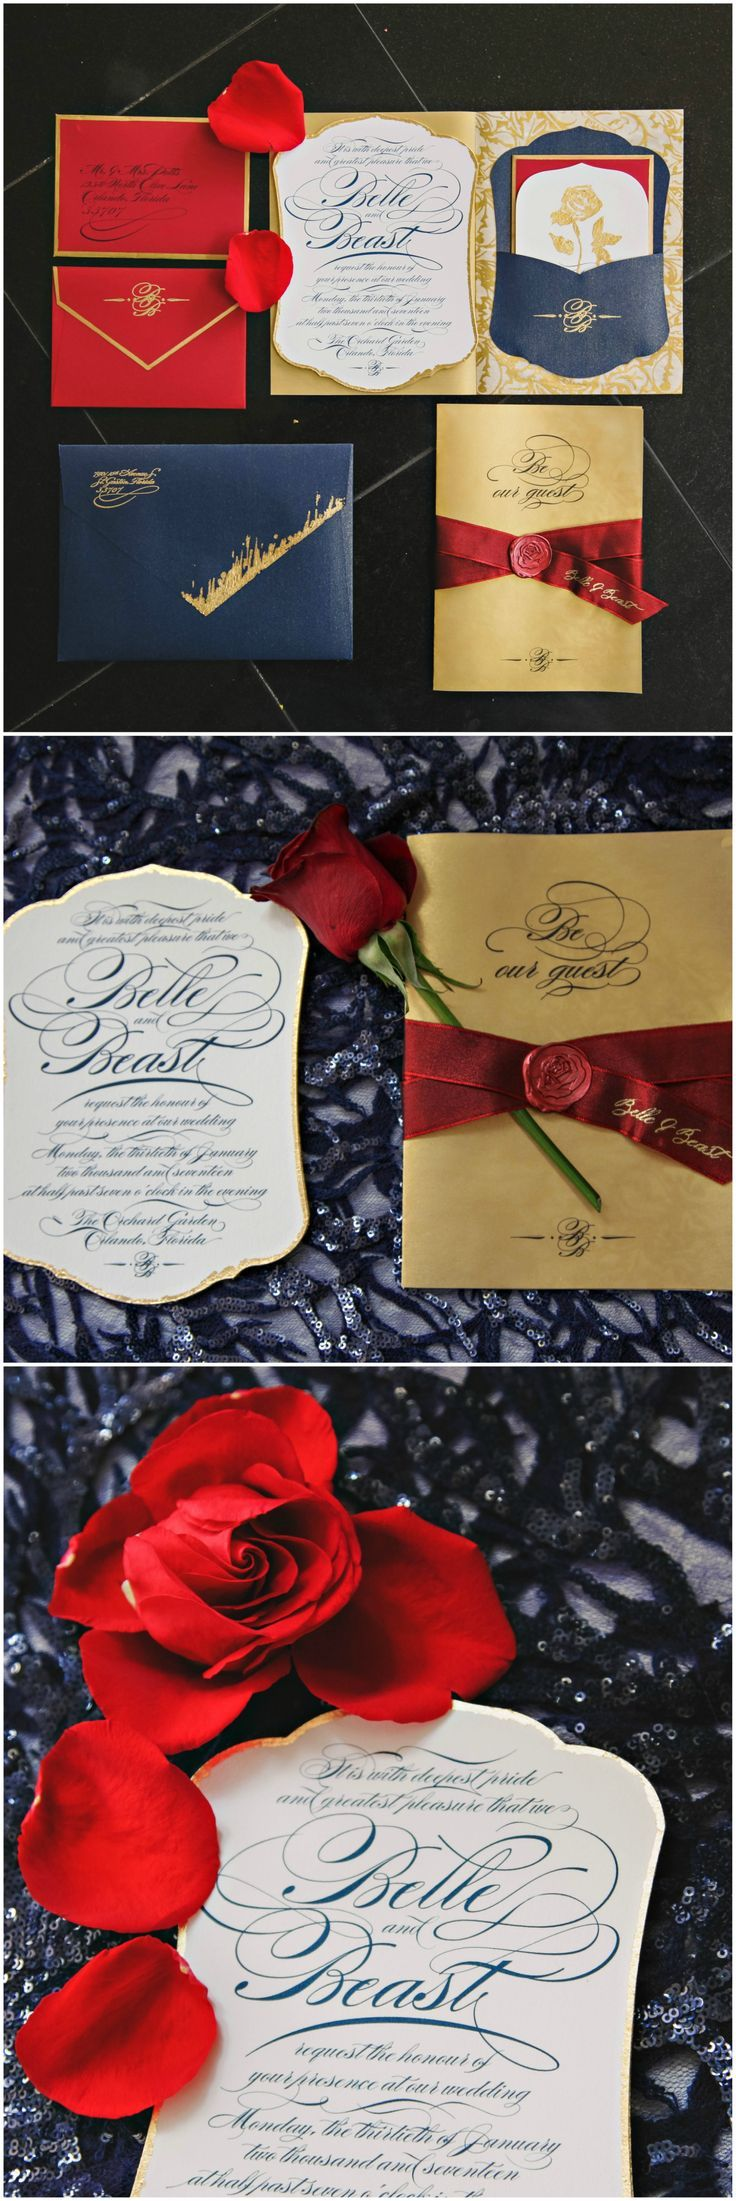 48 best Boutonnieres images on Pinterest | Bridal bouquets, Wedding ...